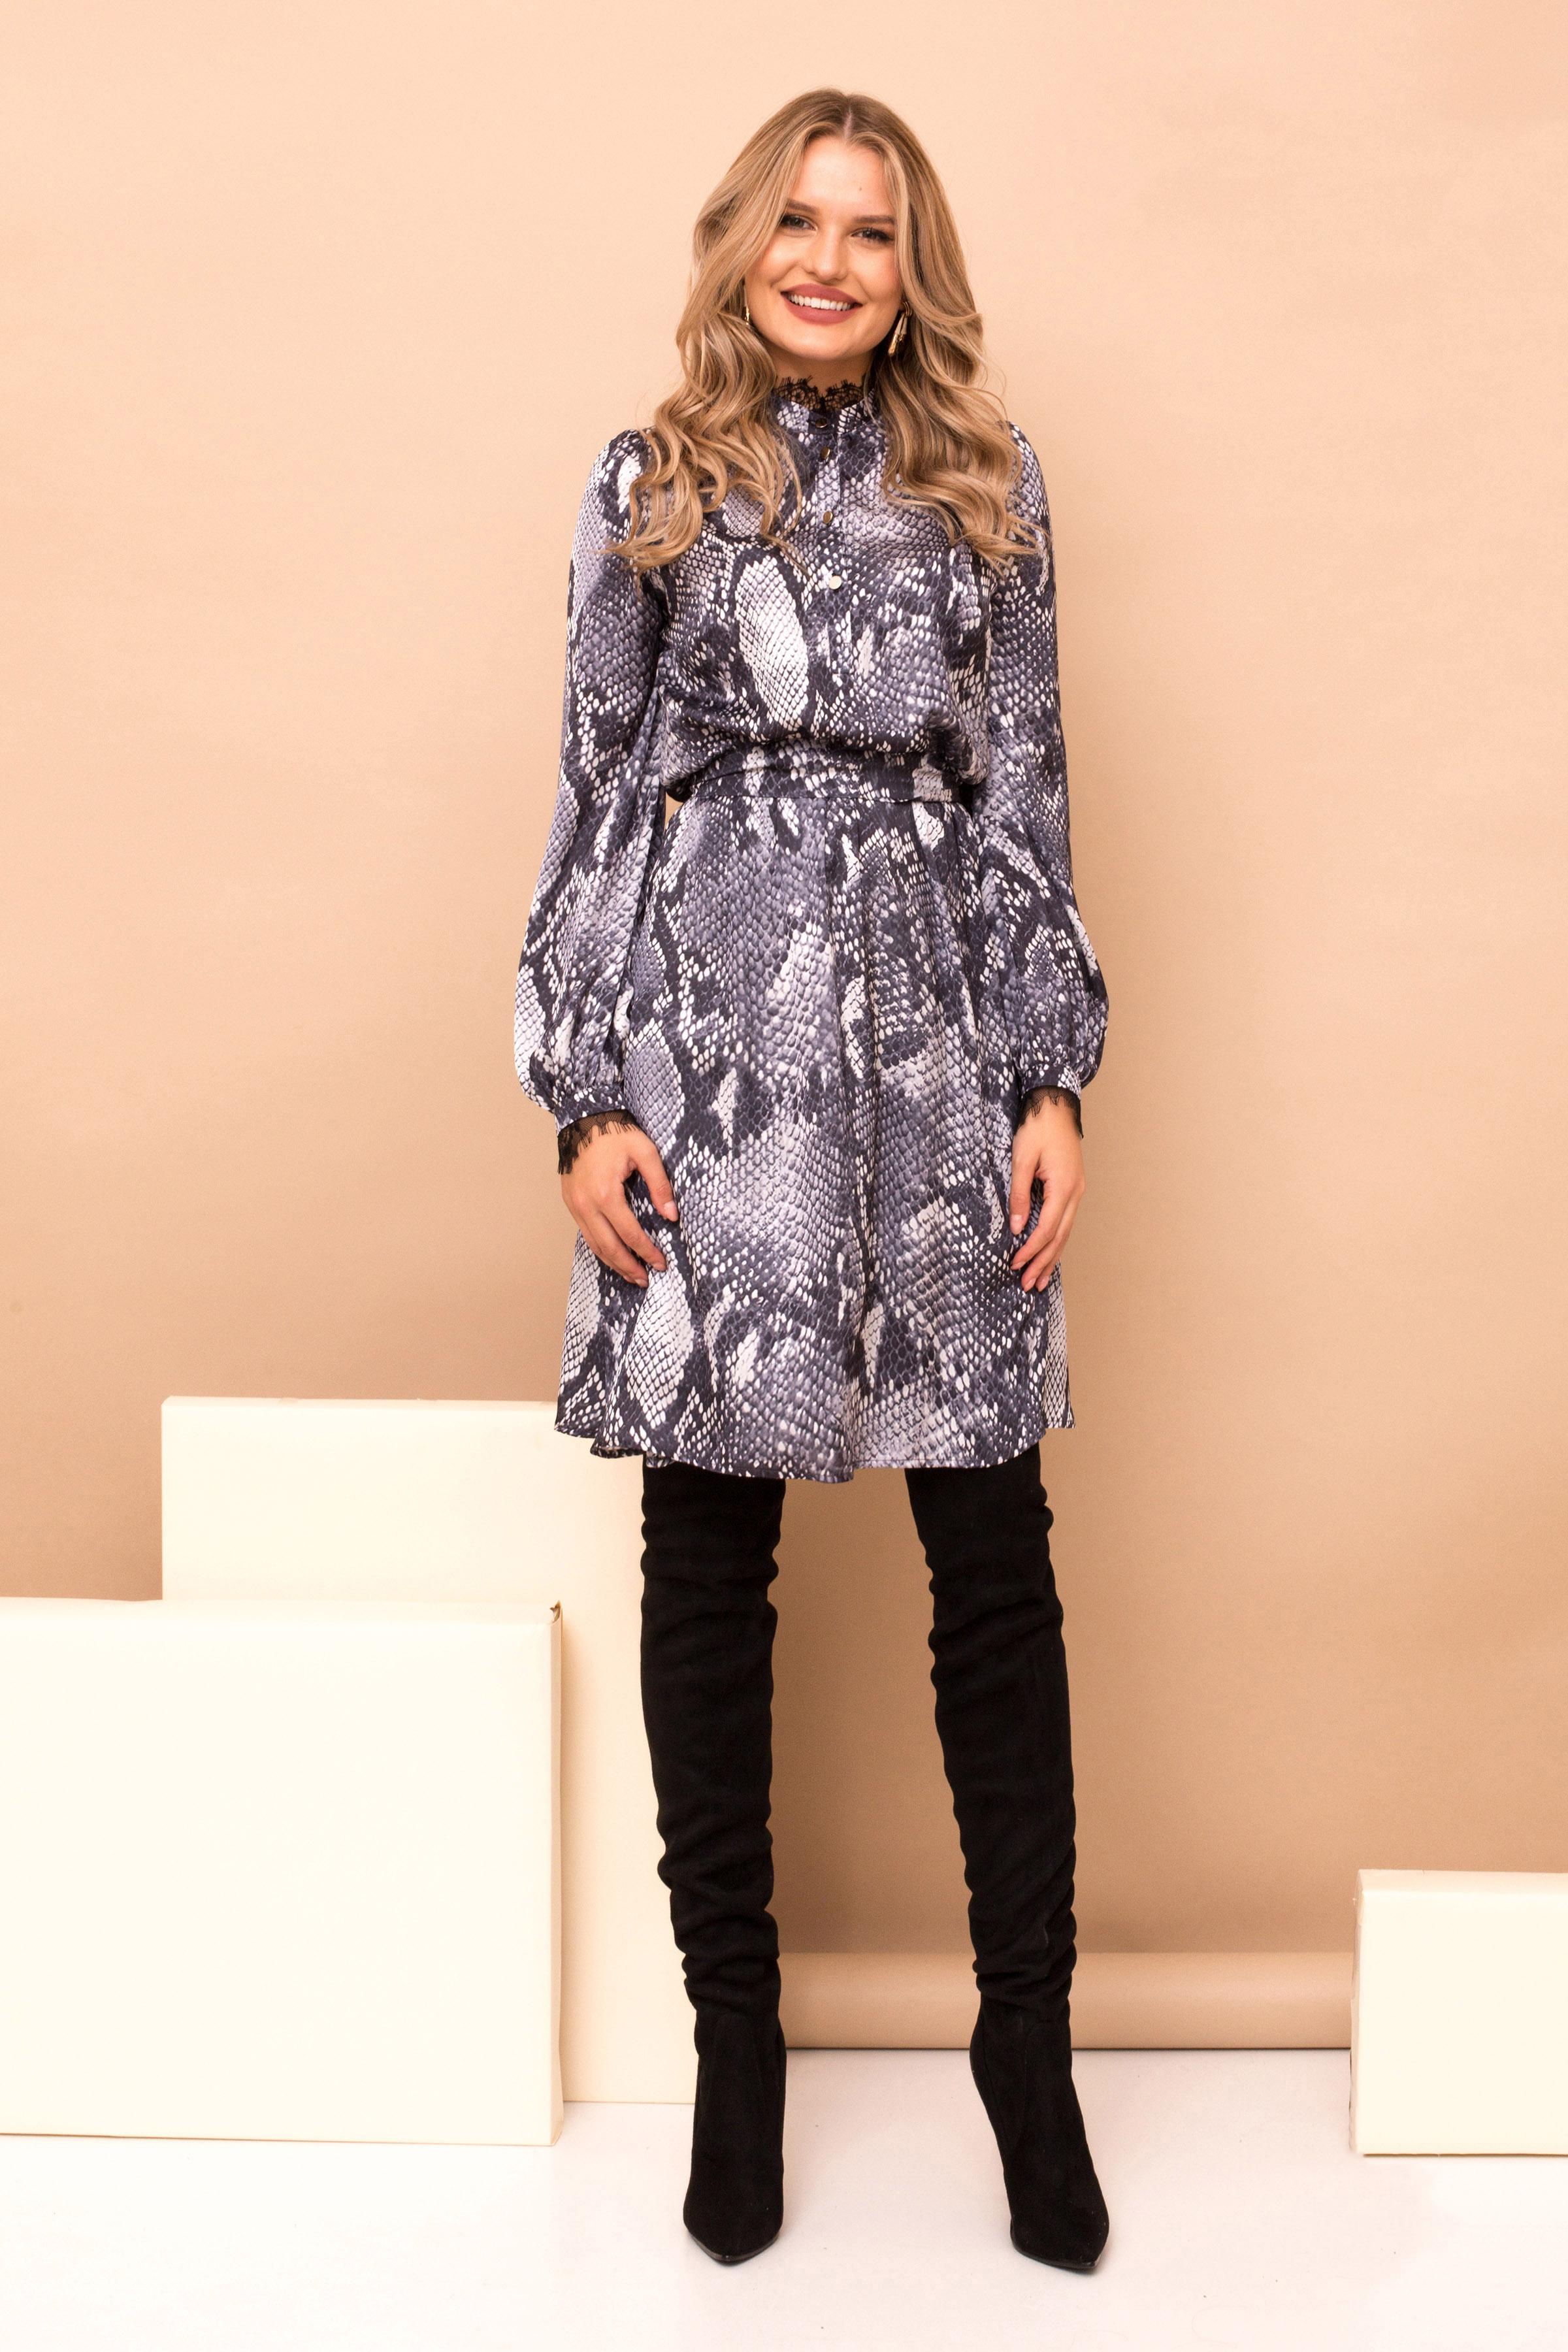 Grey dress elastic waist long sleeve midi cloche